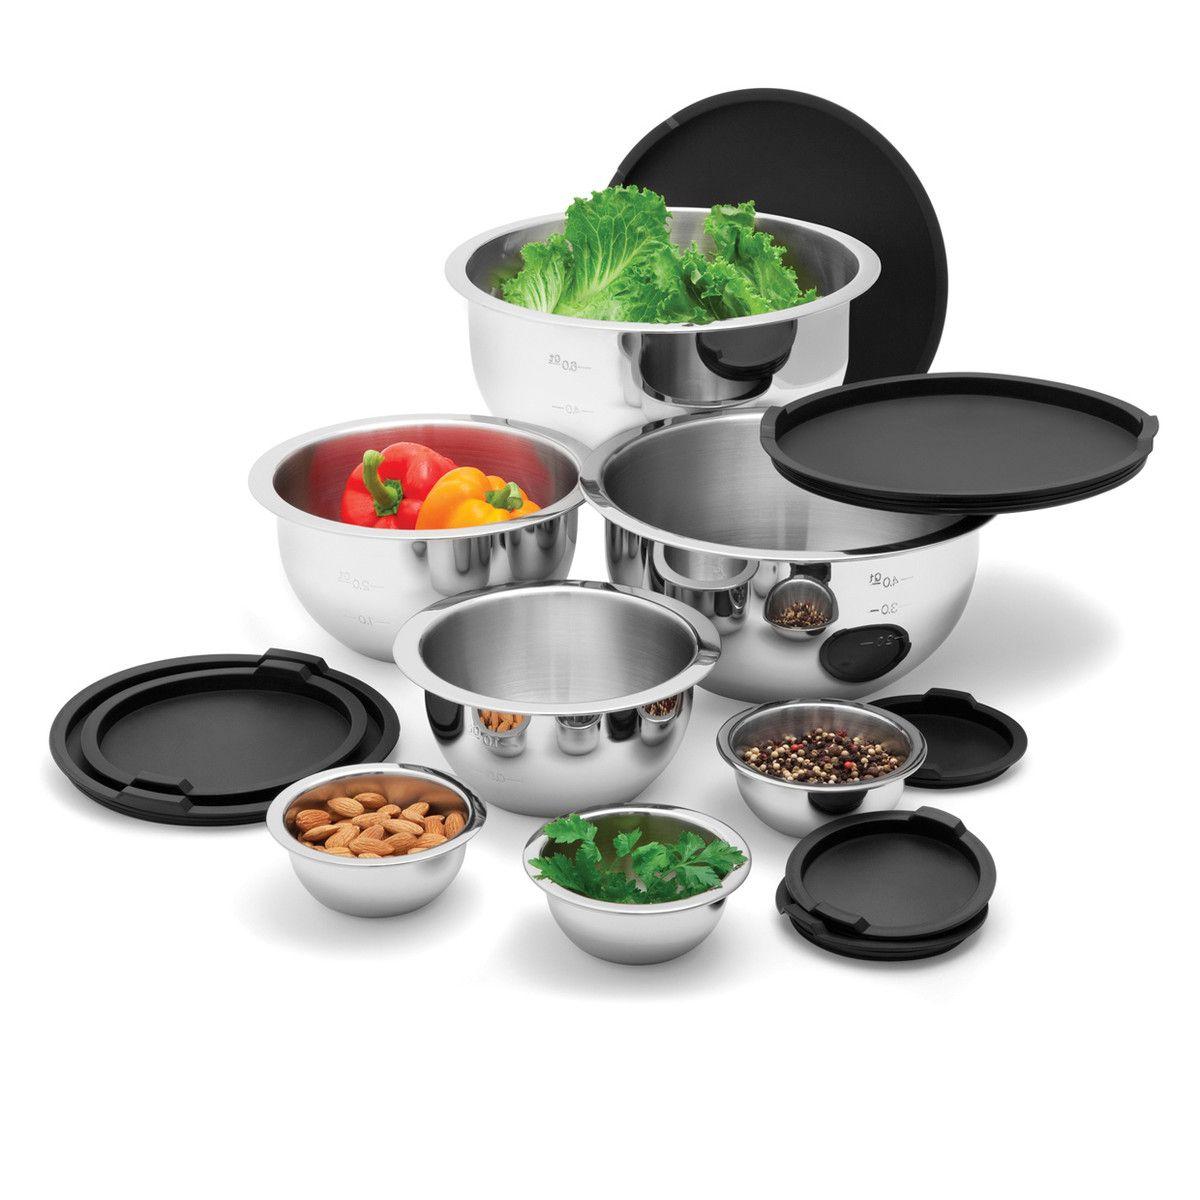 dishwasher safe mixing bowls with lids fantastic wolfgang puck